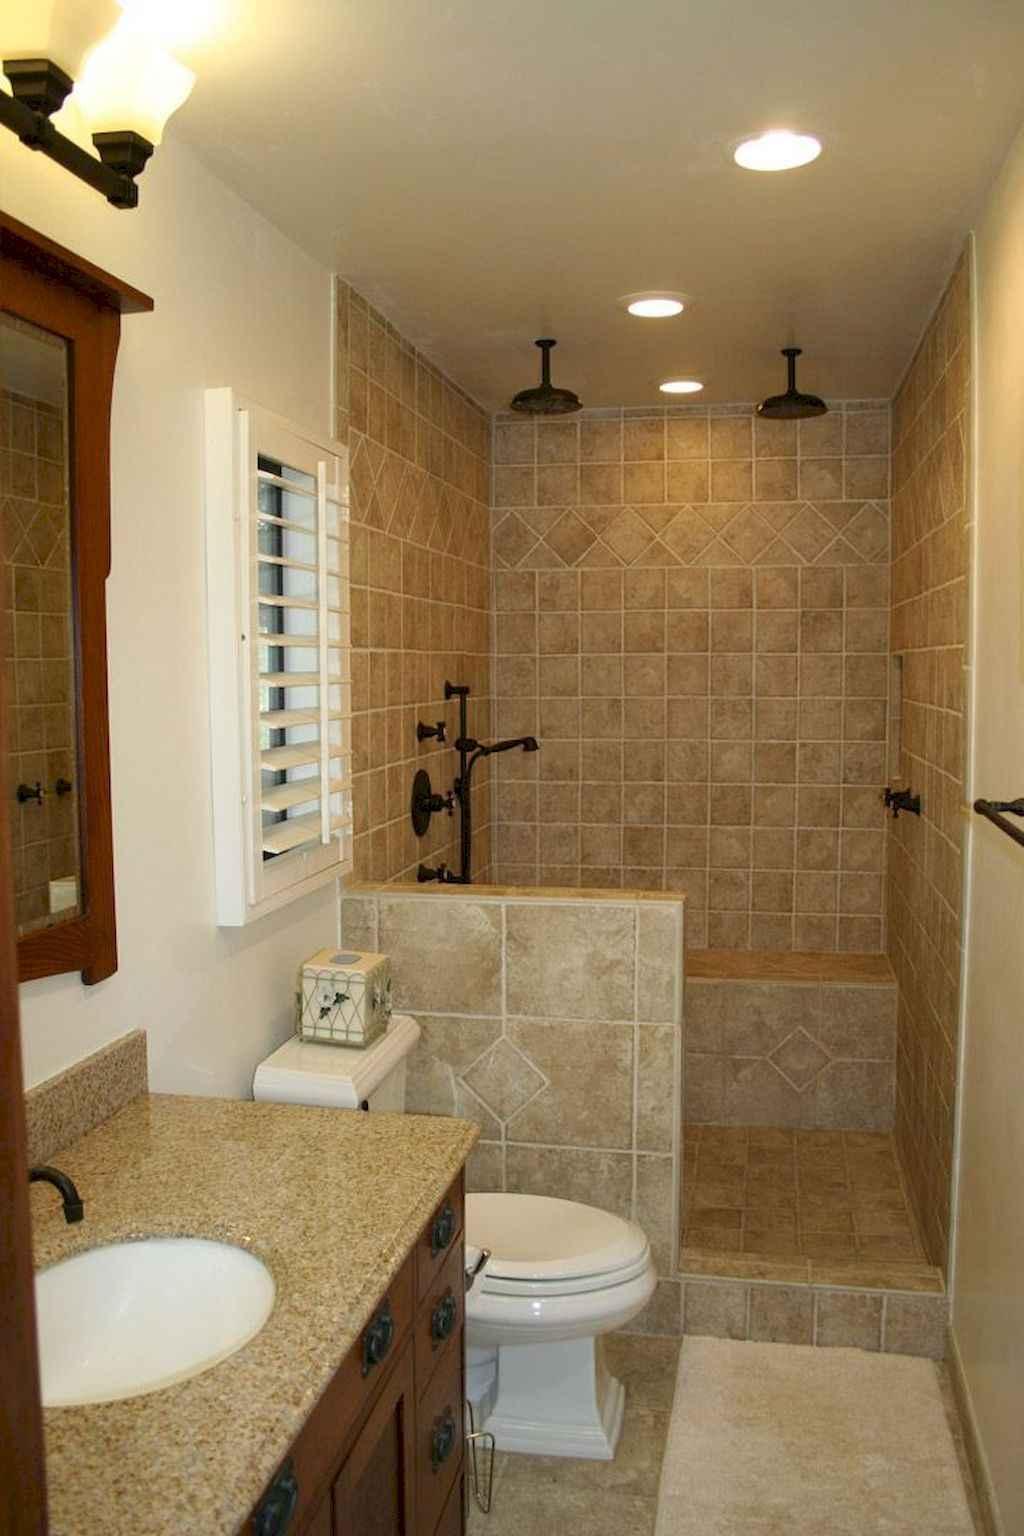 111 Brilliant Small Bathroom Remodel Ideas On A Budget (82)